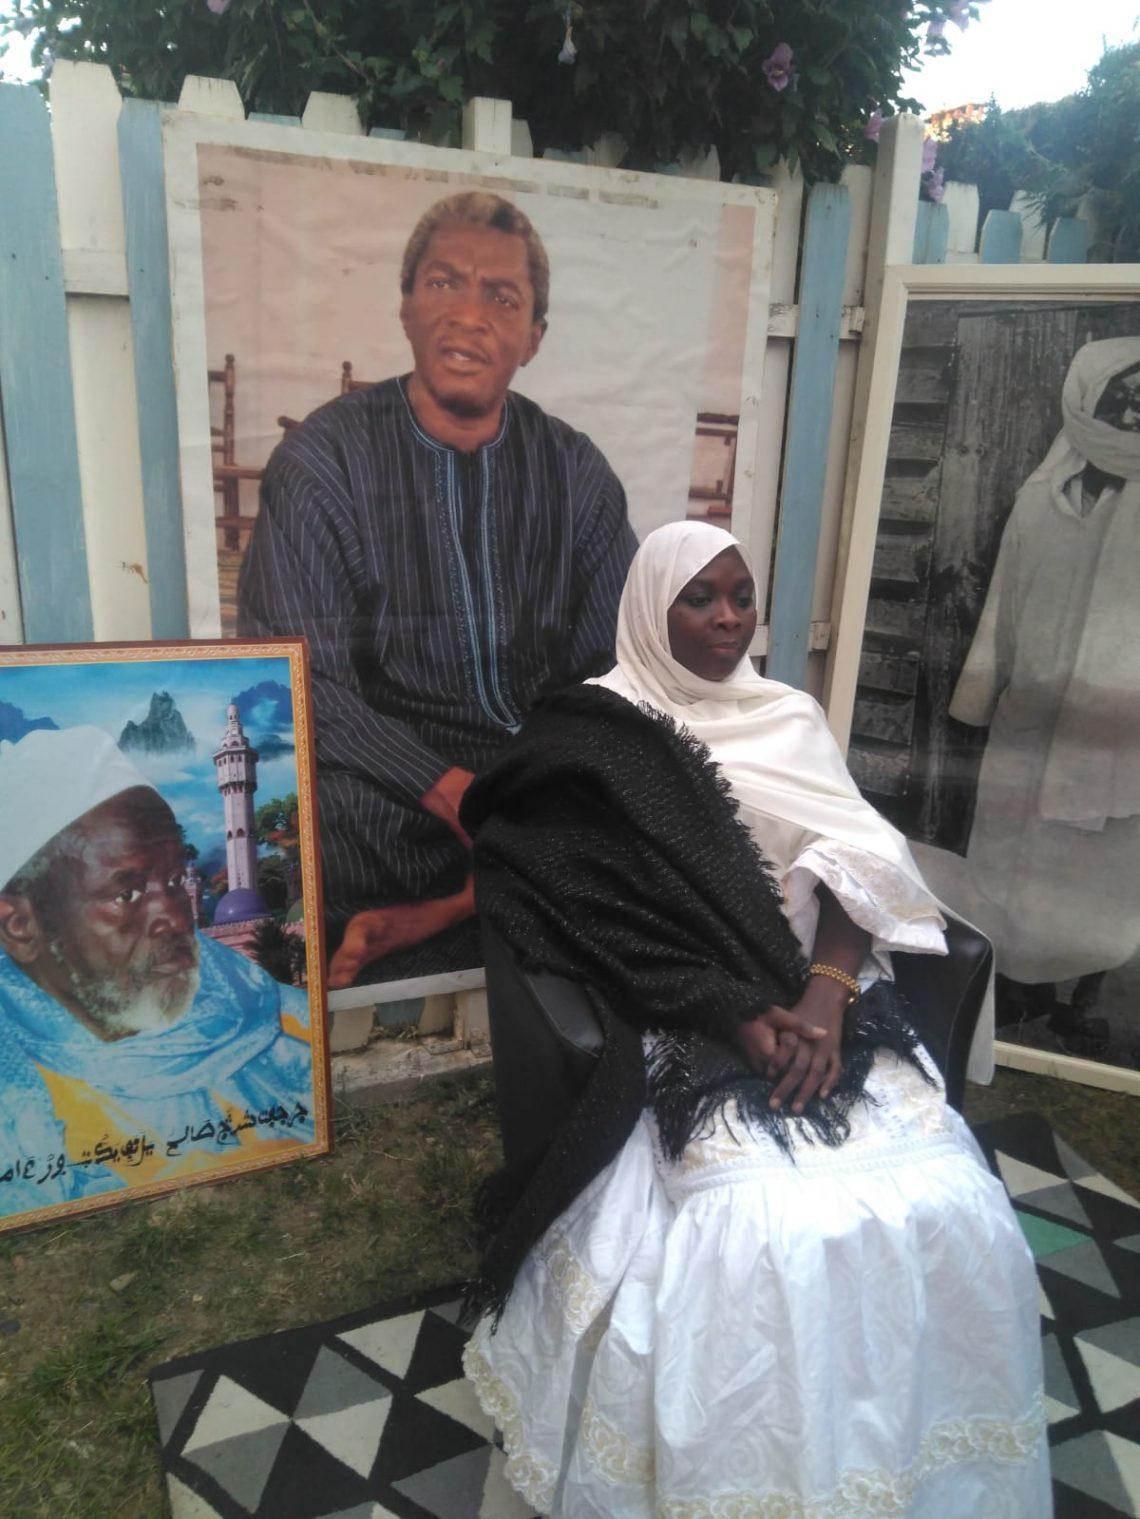 Sokhna Maï Lahad Mbacké Bintou Cheikh Abdou Karim en tournée en Europe